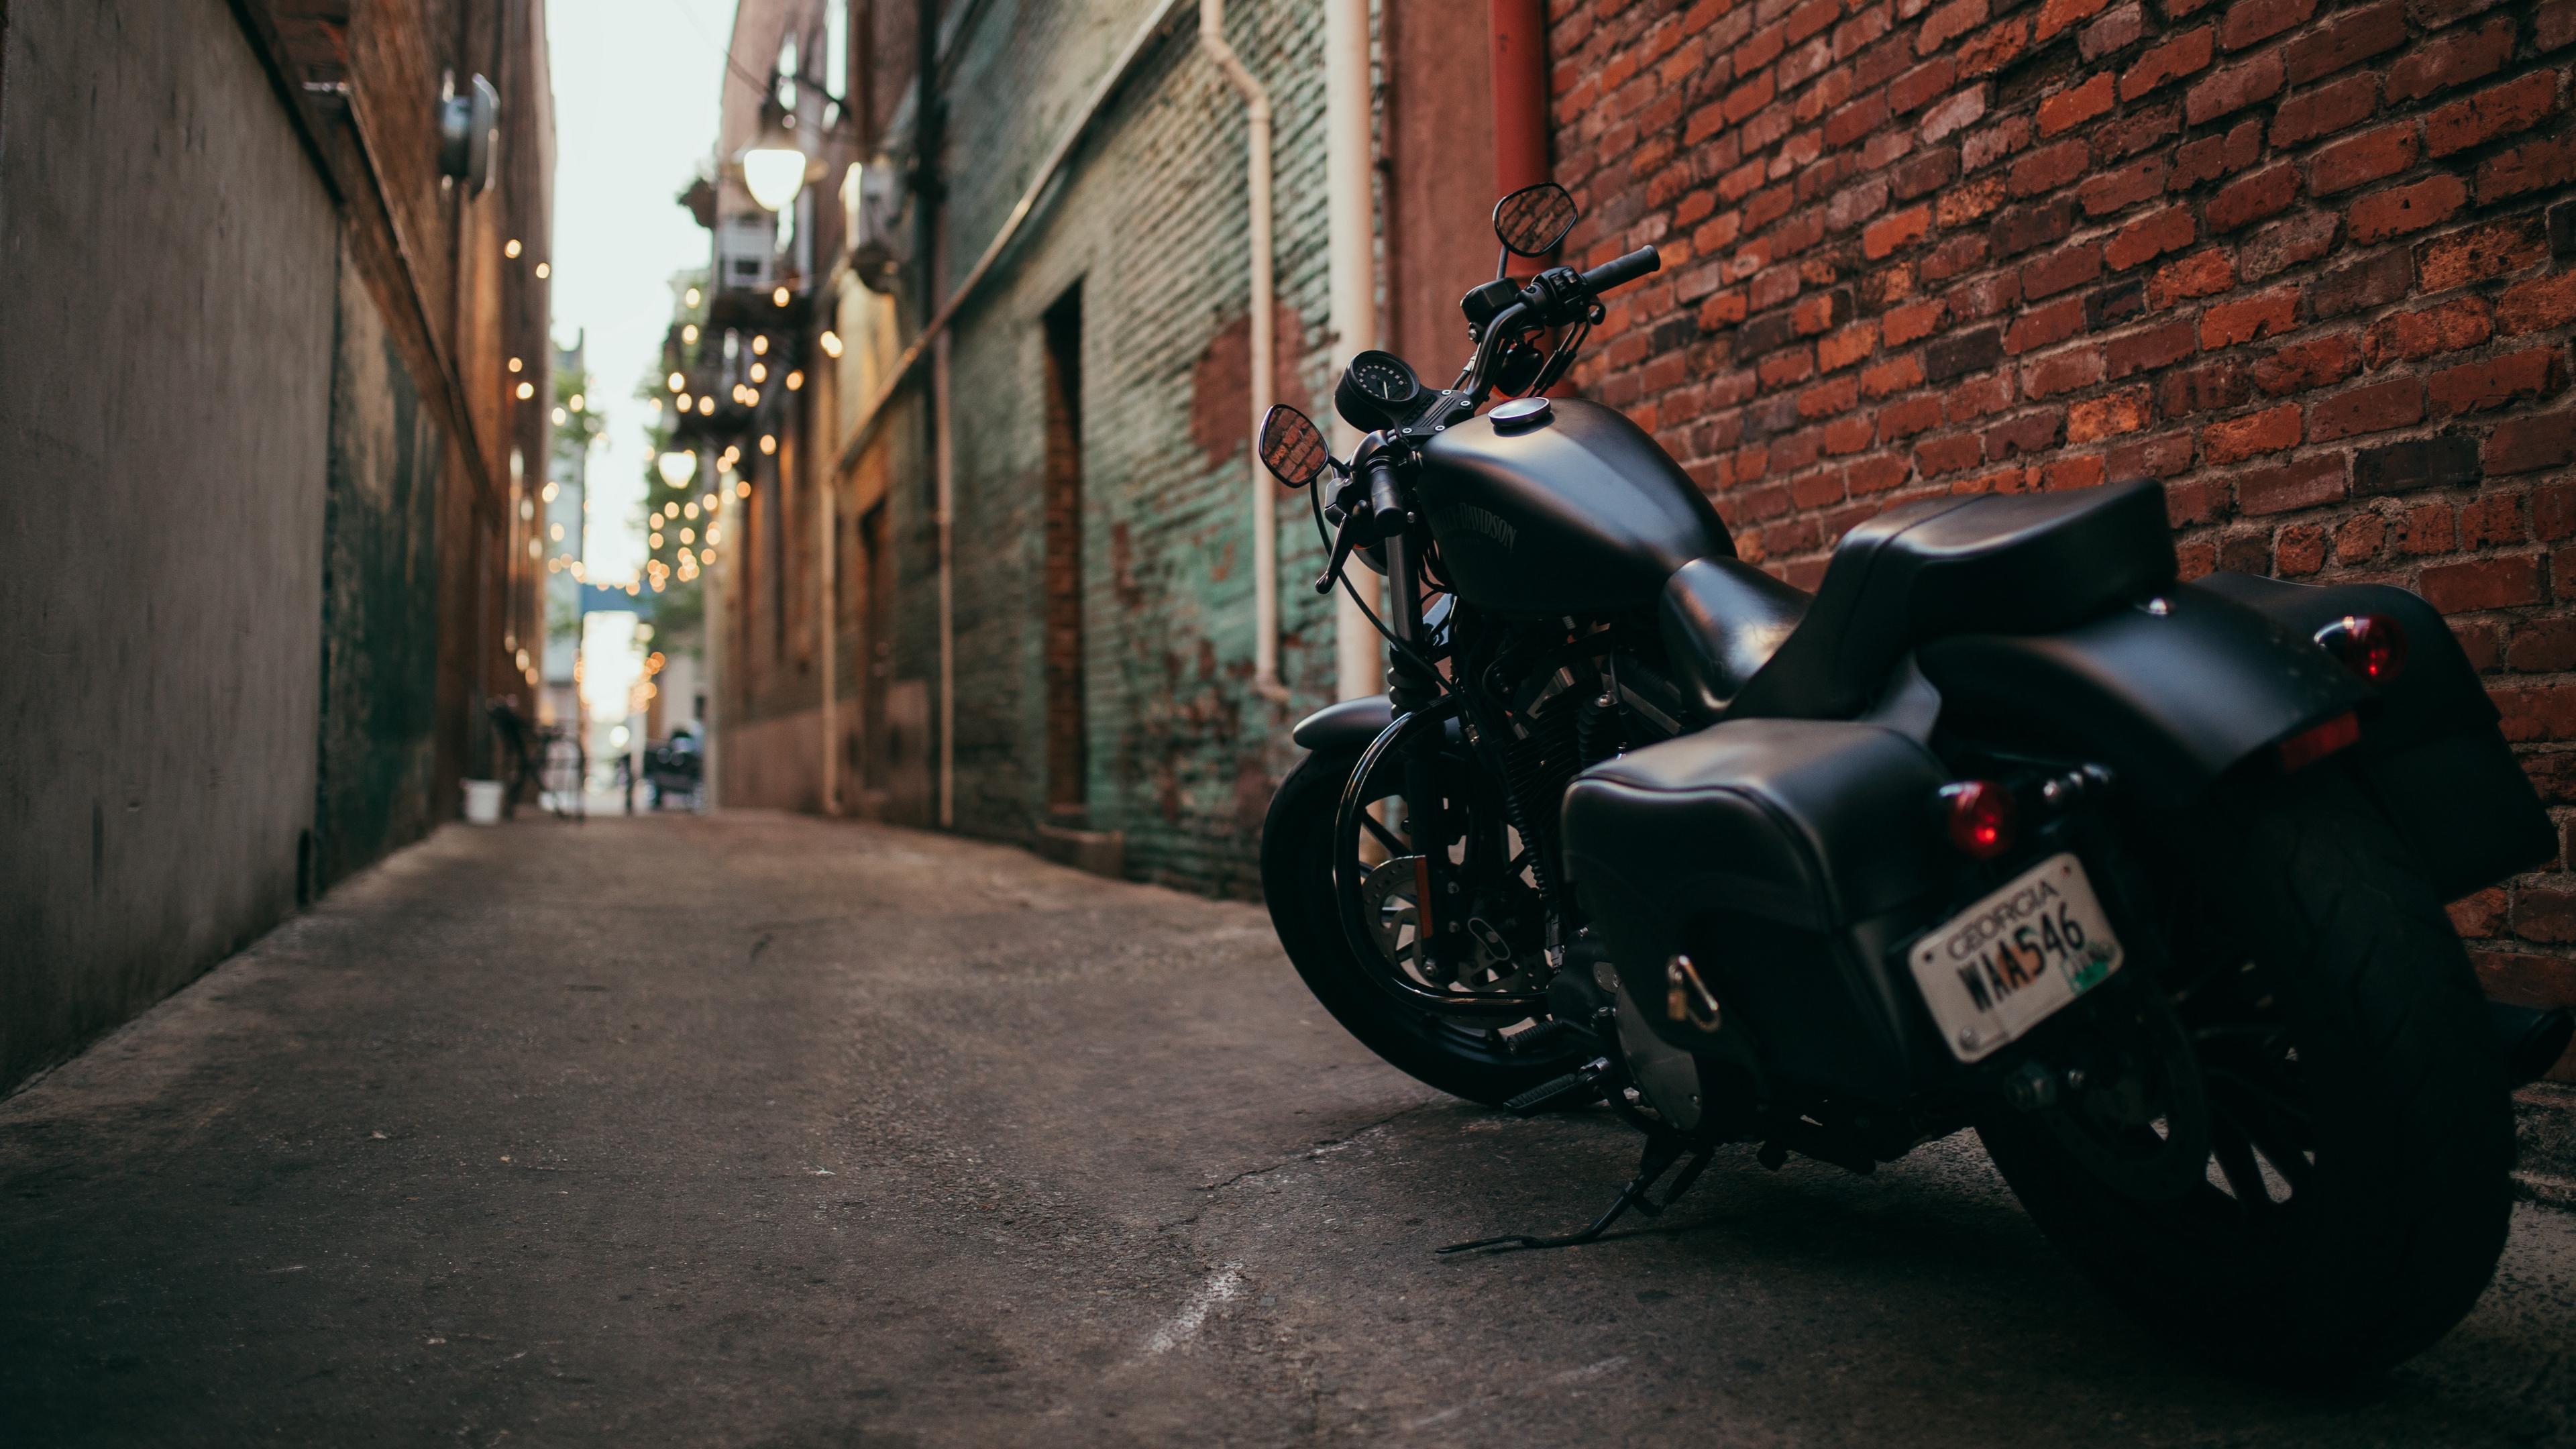 bike motorcycle side view yard 4k 1536018947 - bike, motorcycle, side view, yard 4k - side view, Motorcycle, Bike